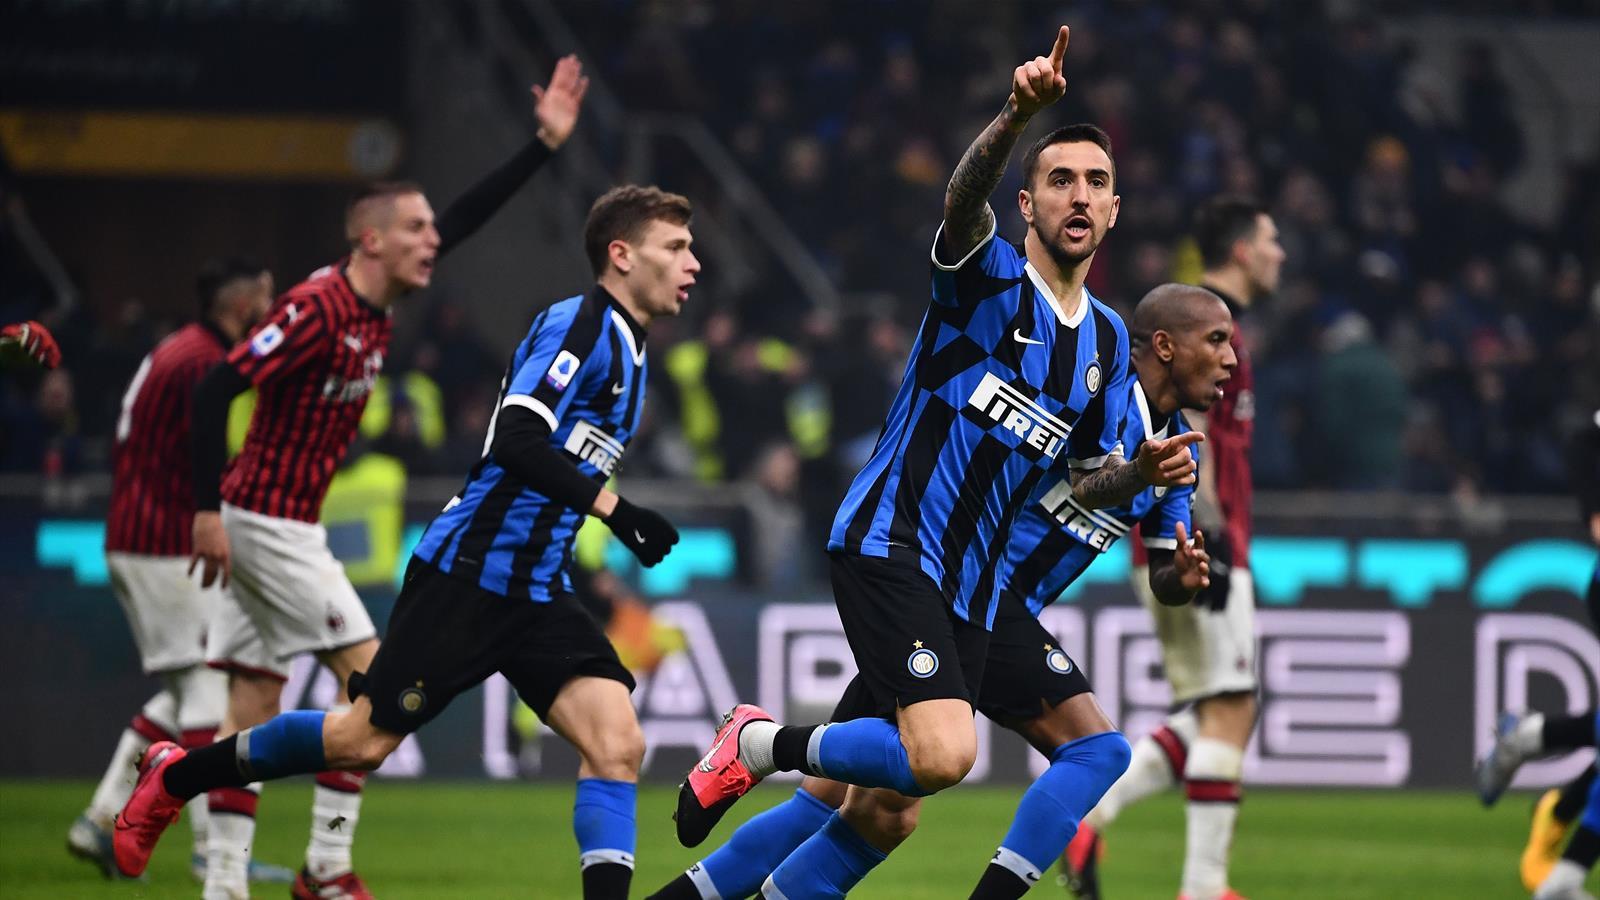 Menée 2-0, l'Inter a renversé l'AC Milan (4-2) - Serie A 2019-2020 - Football - Eurosport